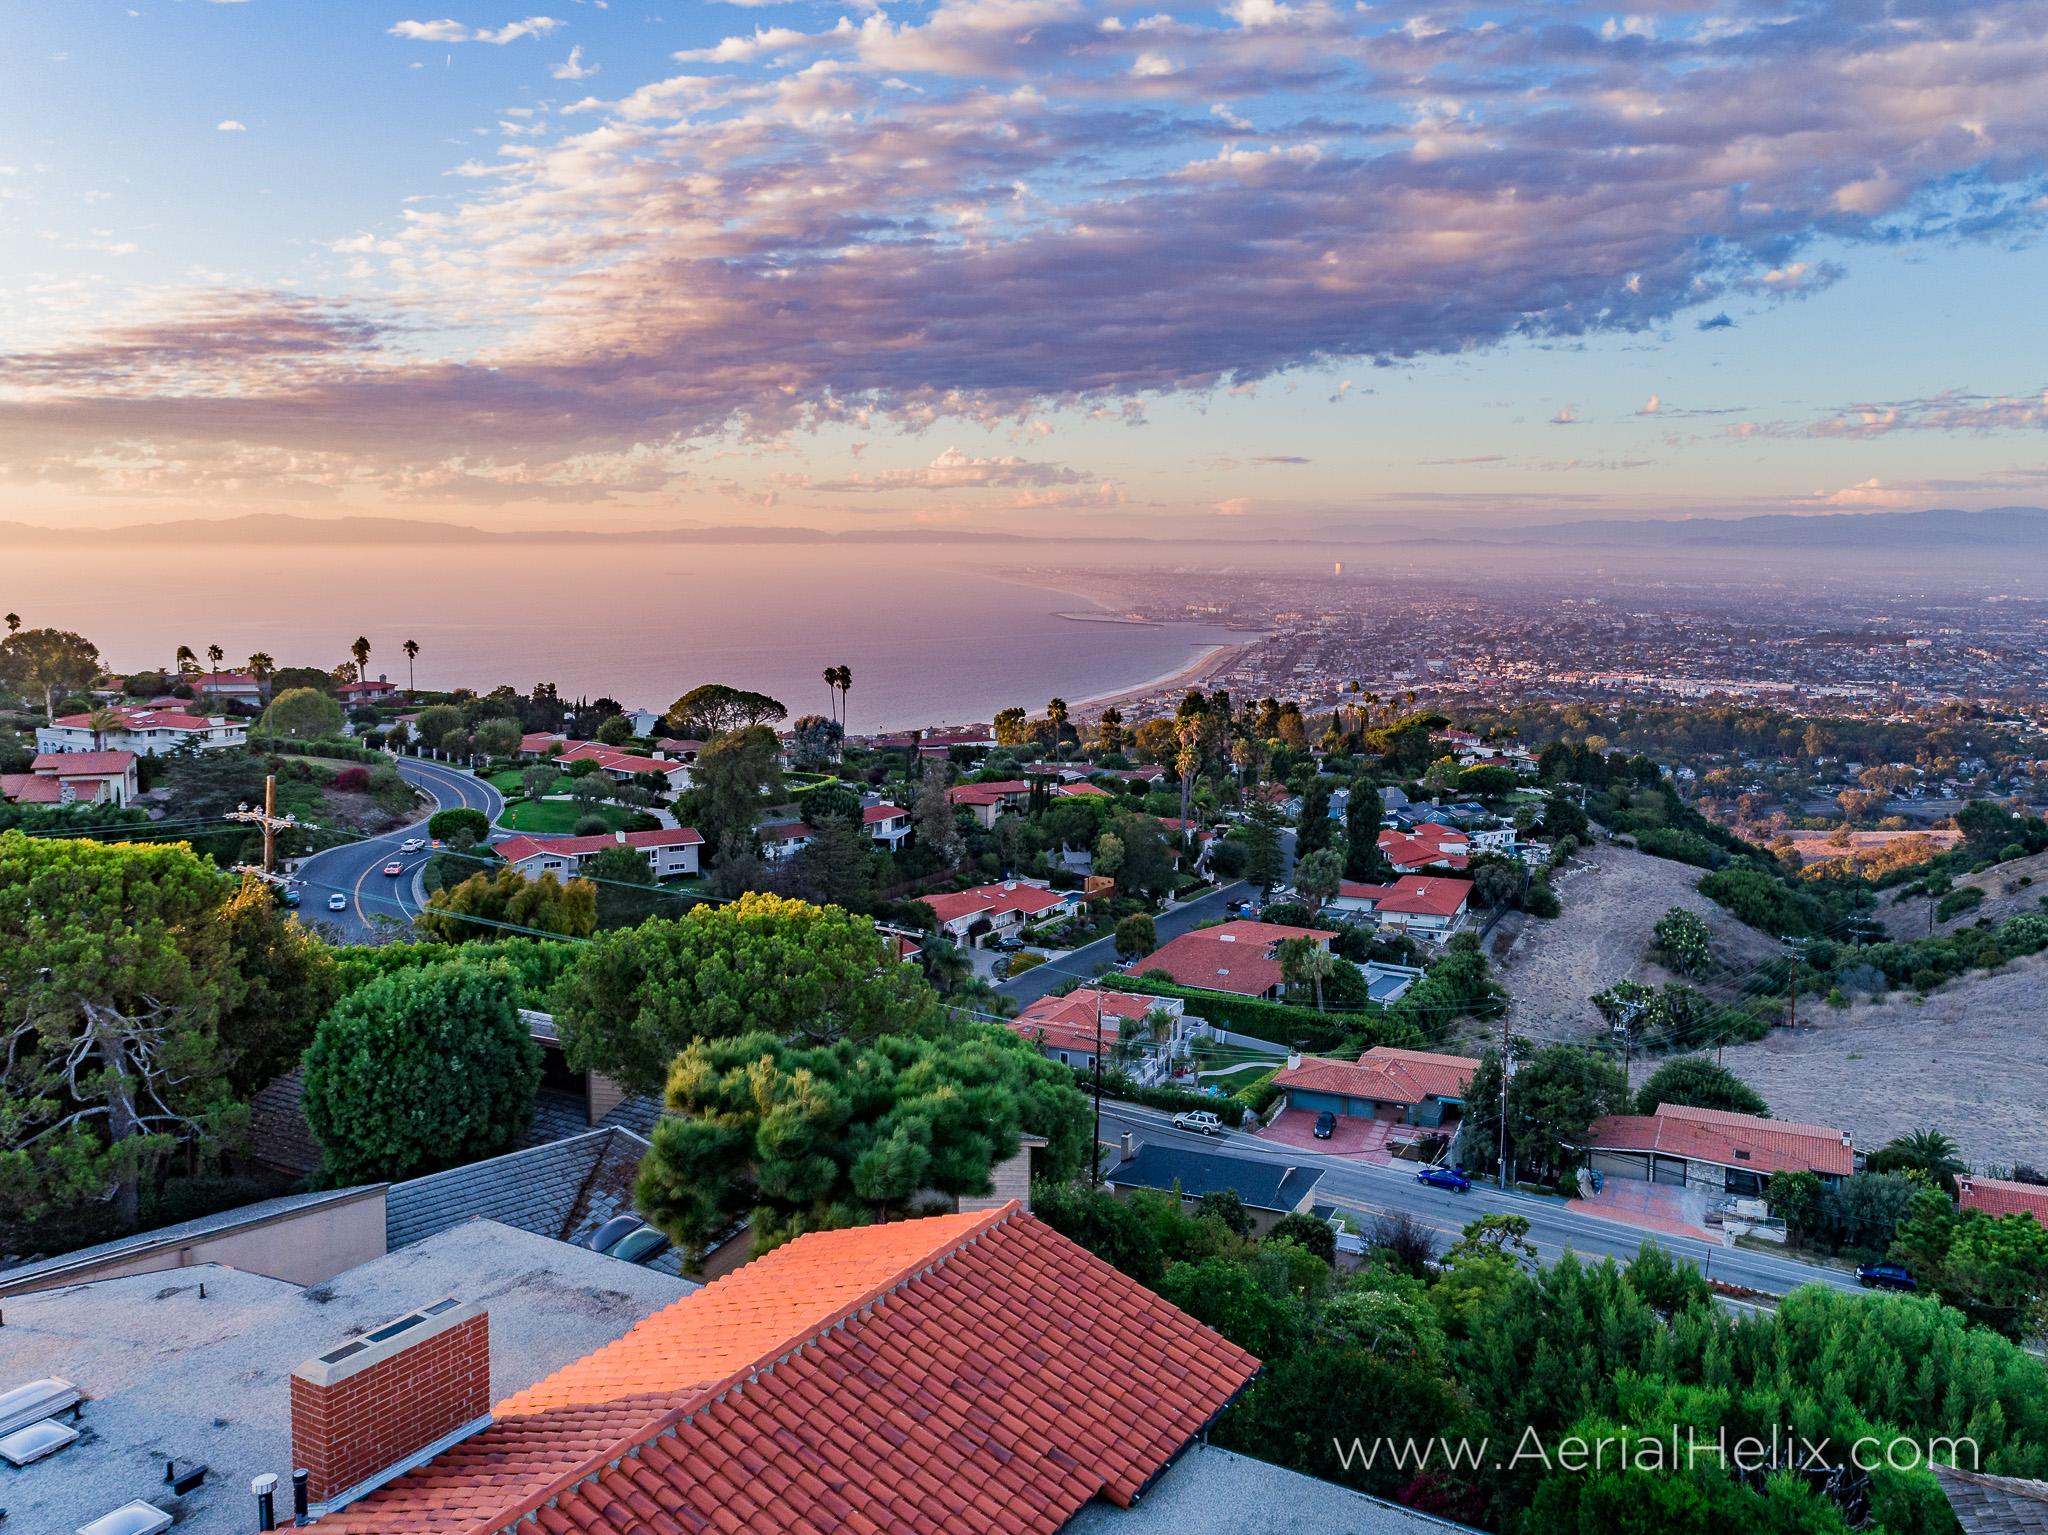 Woodfern Drive - HELIX Real Estate Aerial Photographer-21.jpg